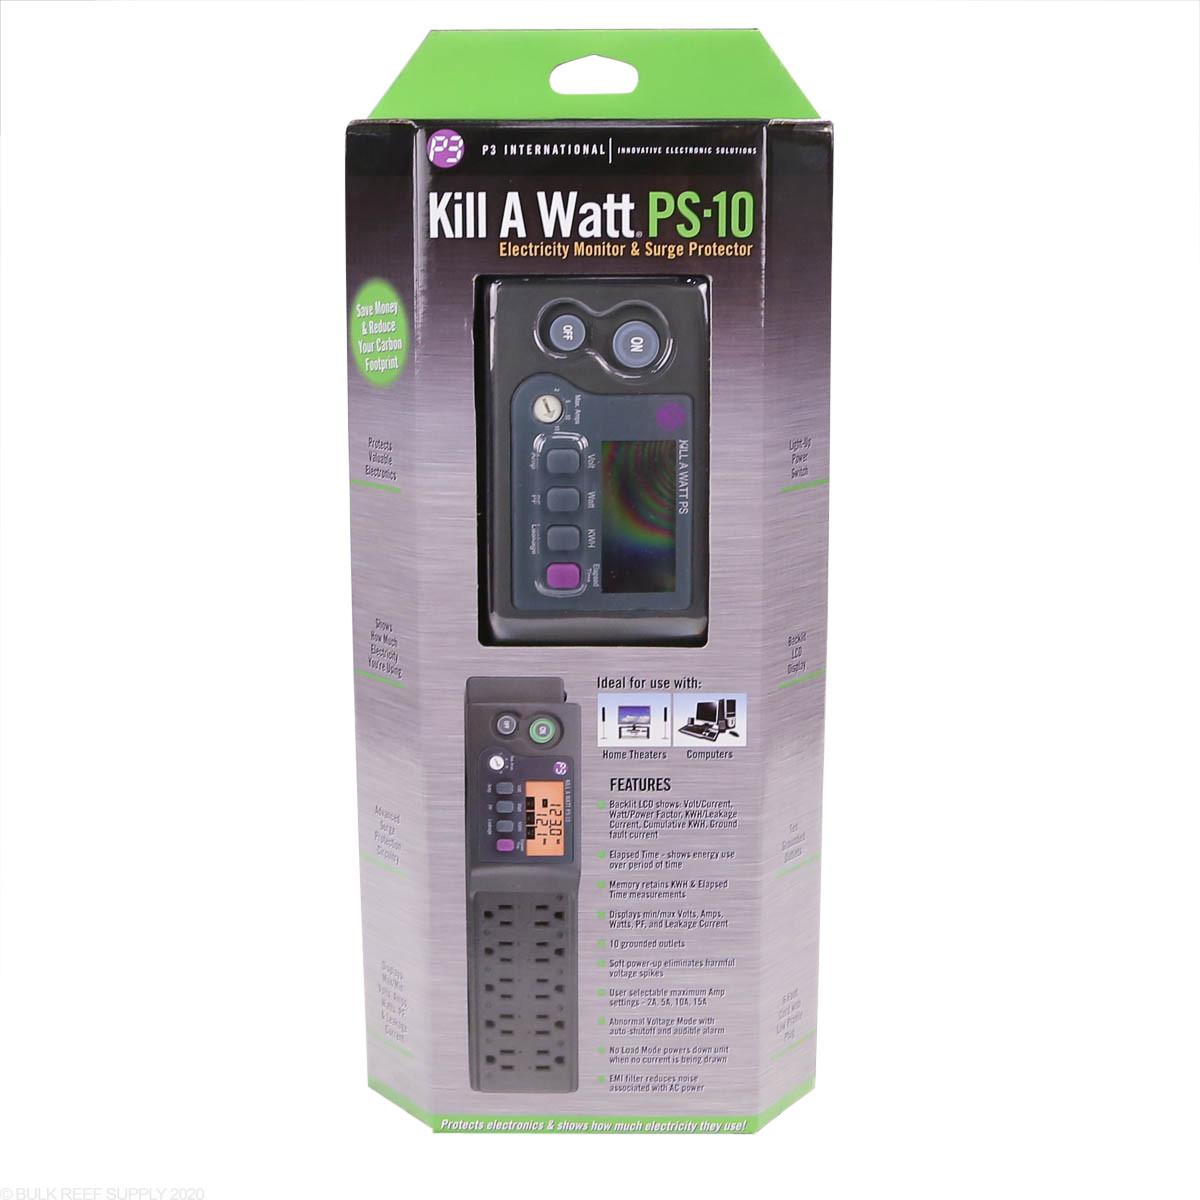 P3 Kill A Watt PS-10 10-Outlets Power Strip